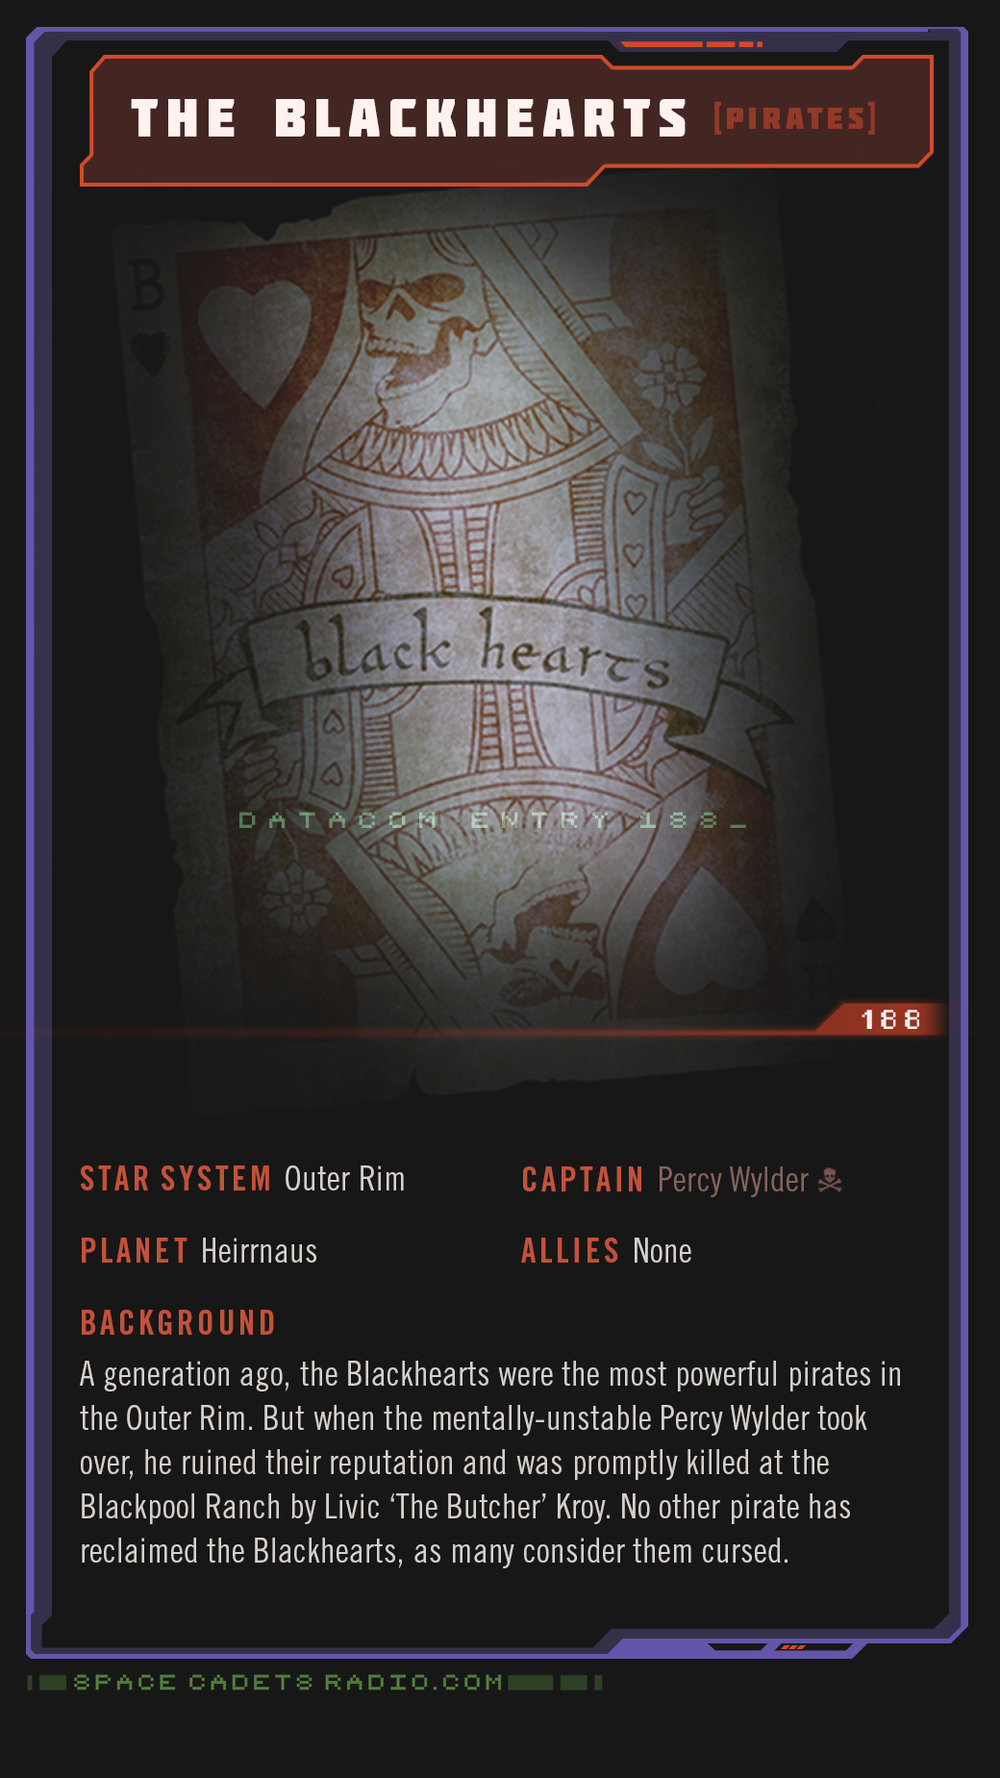 Blackhearts_profile.jpg